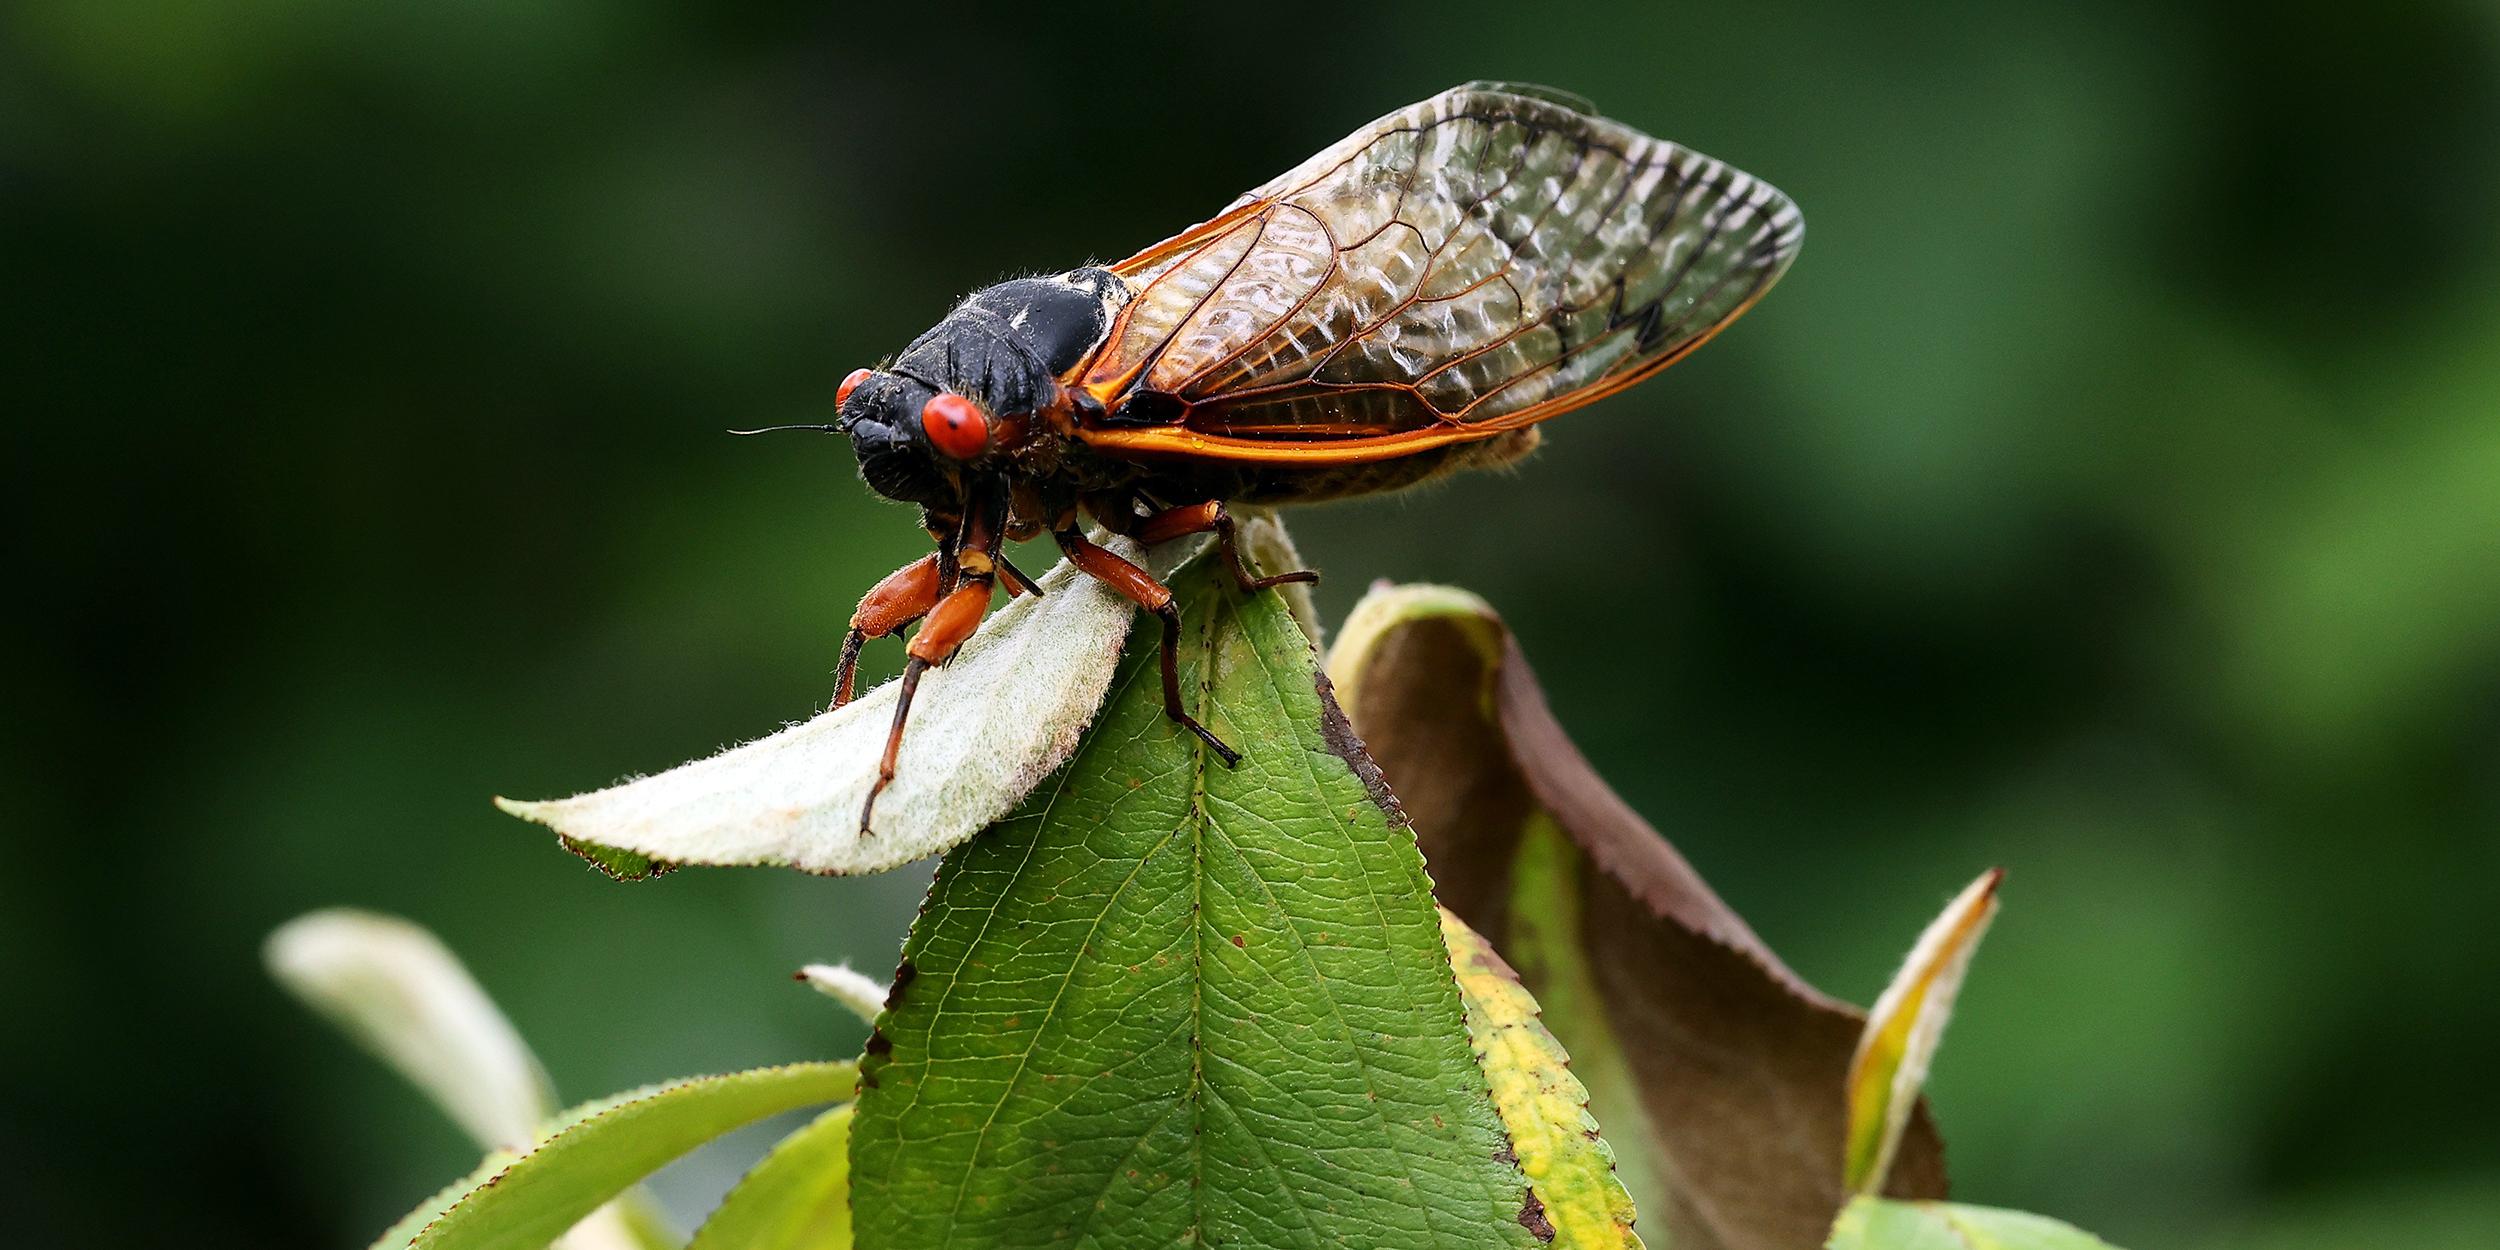 NBC's Hallie Jackson dines on cicada scampi